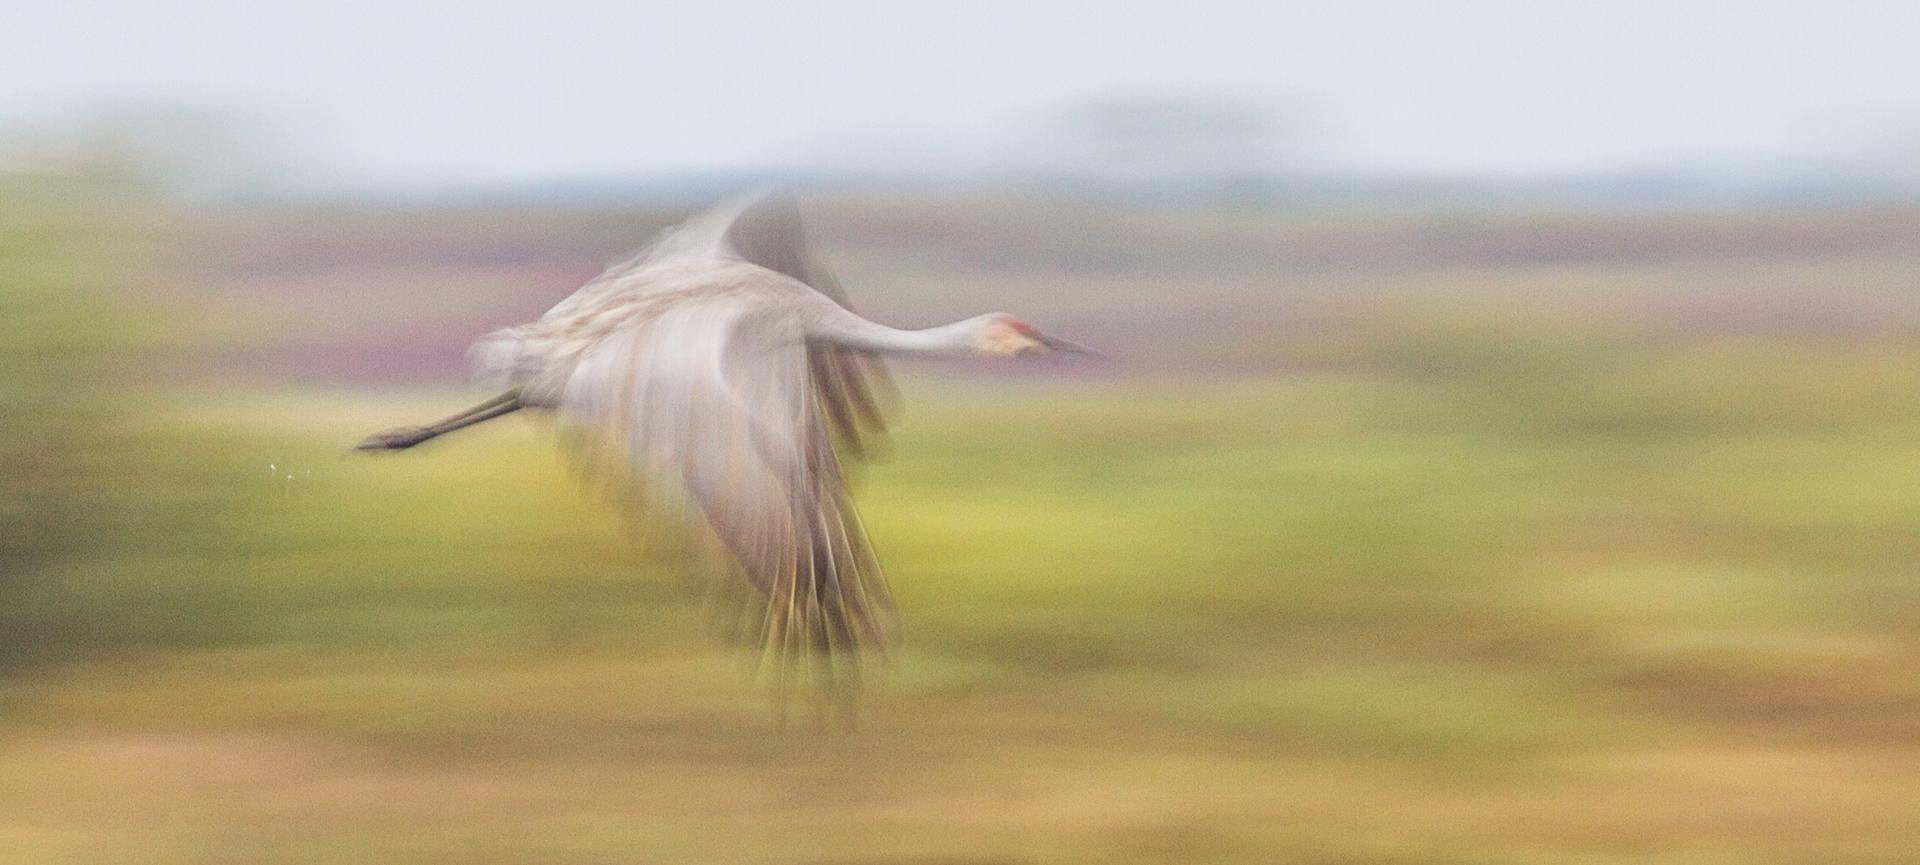 Sandhill Crane motion blur panning flight Crex Meadows Grantsburg WI IMG_0234